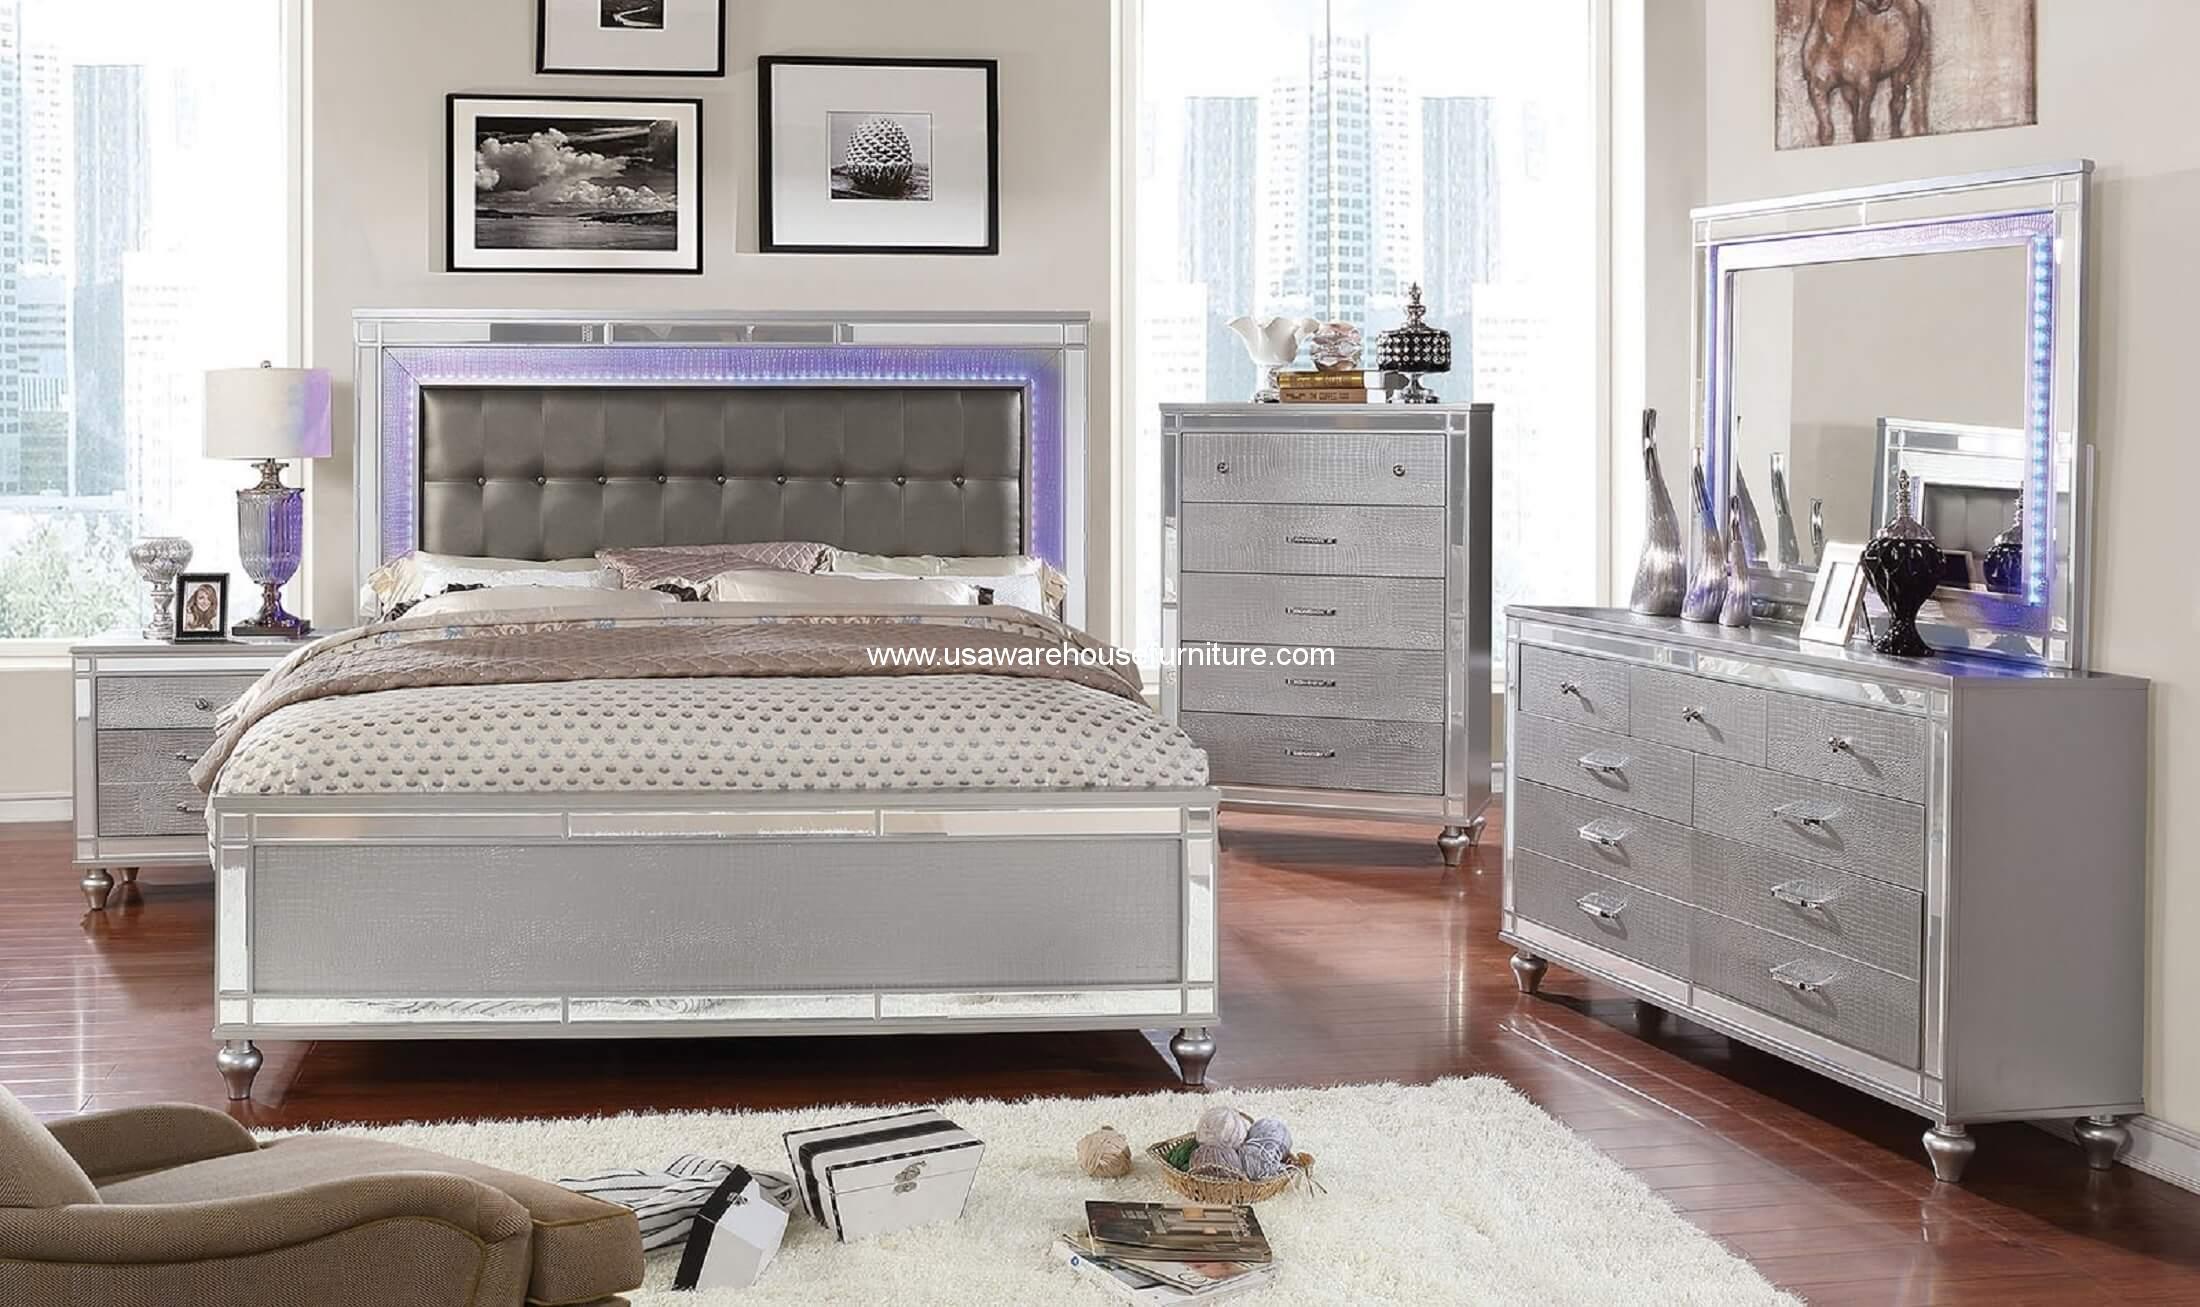 4 piece brachium modern led bedroom set usa warehouse for 4 piece bedroom furniture set